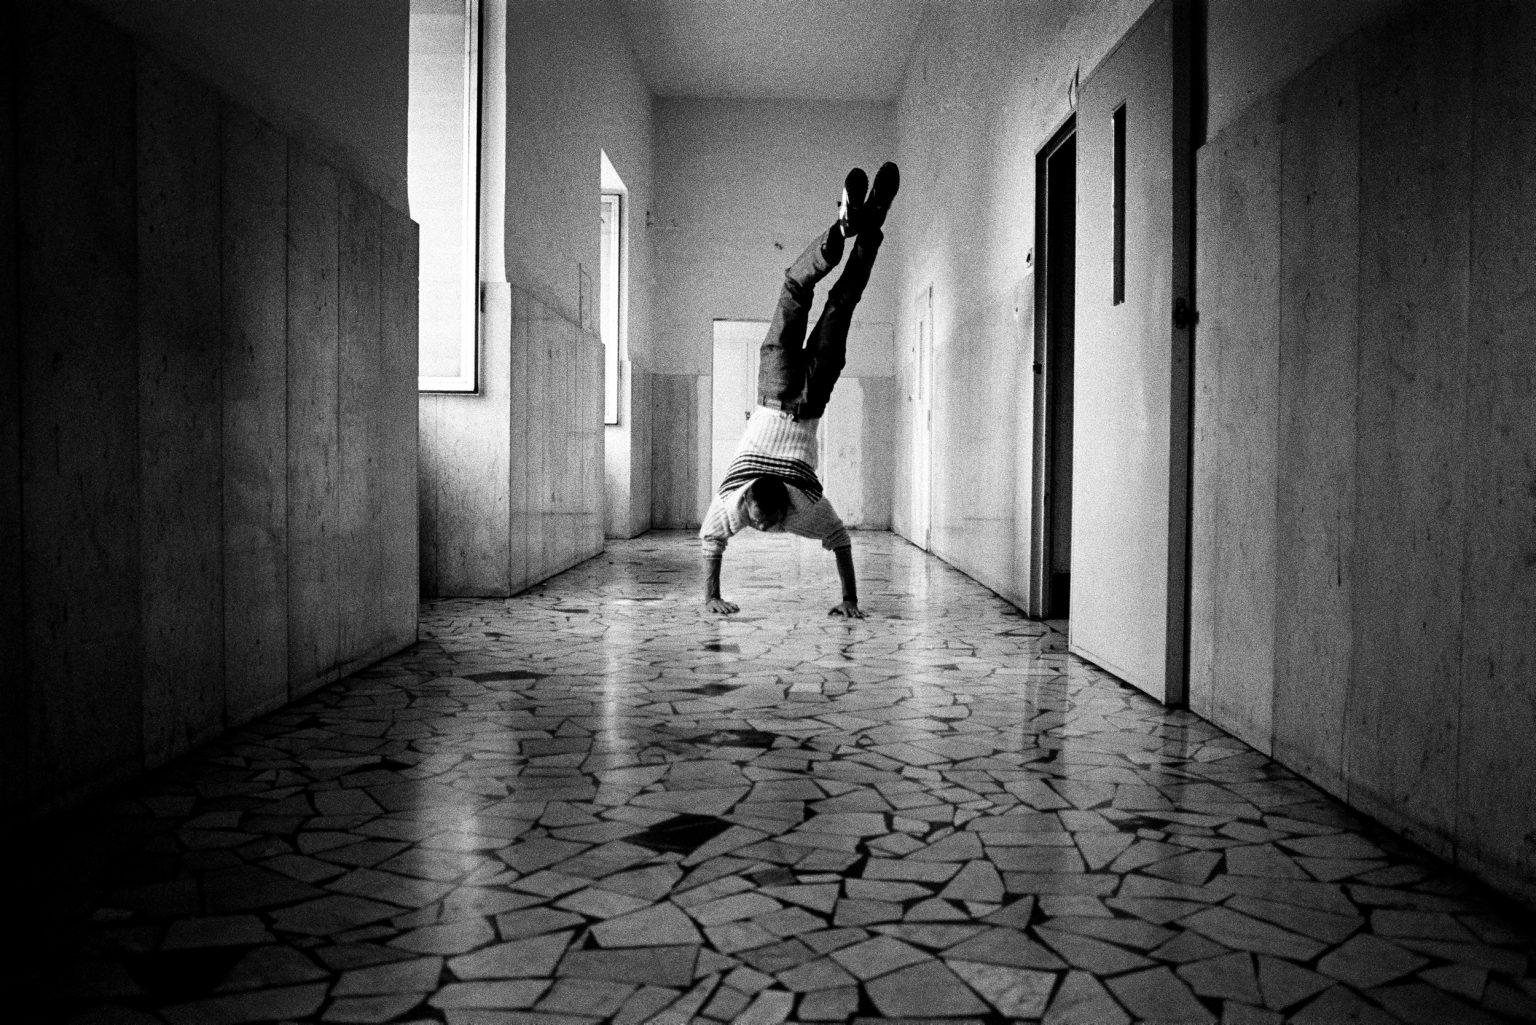 An inmate in the corridor of ward nine. Judicial Psychiatric Hospital. Aversa, Caserta, Italy, 2007